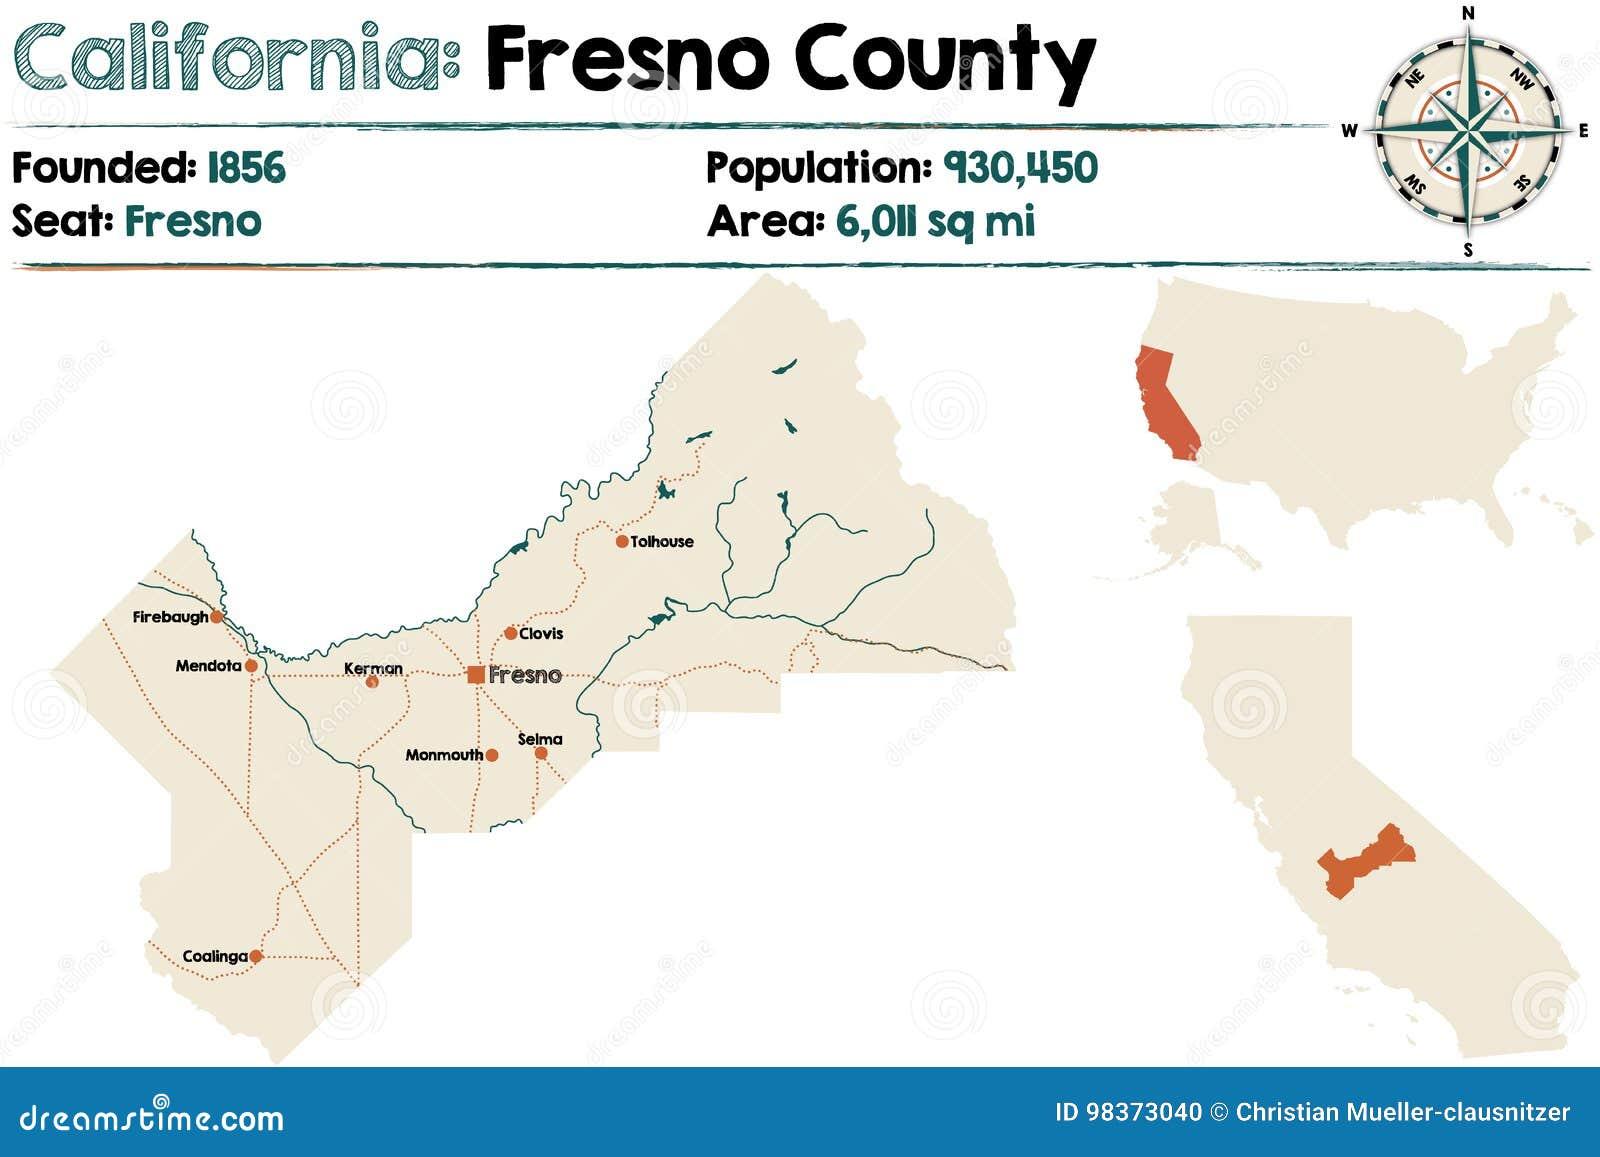 Map Of California Fresno.California Fresno County Map Stock Vector Illustration Of